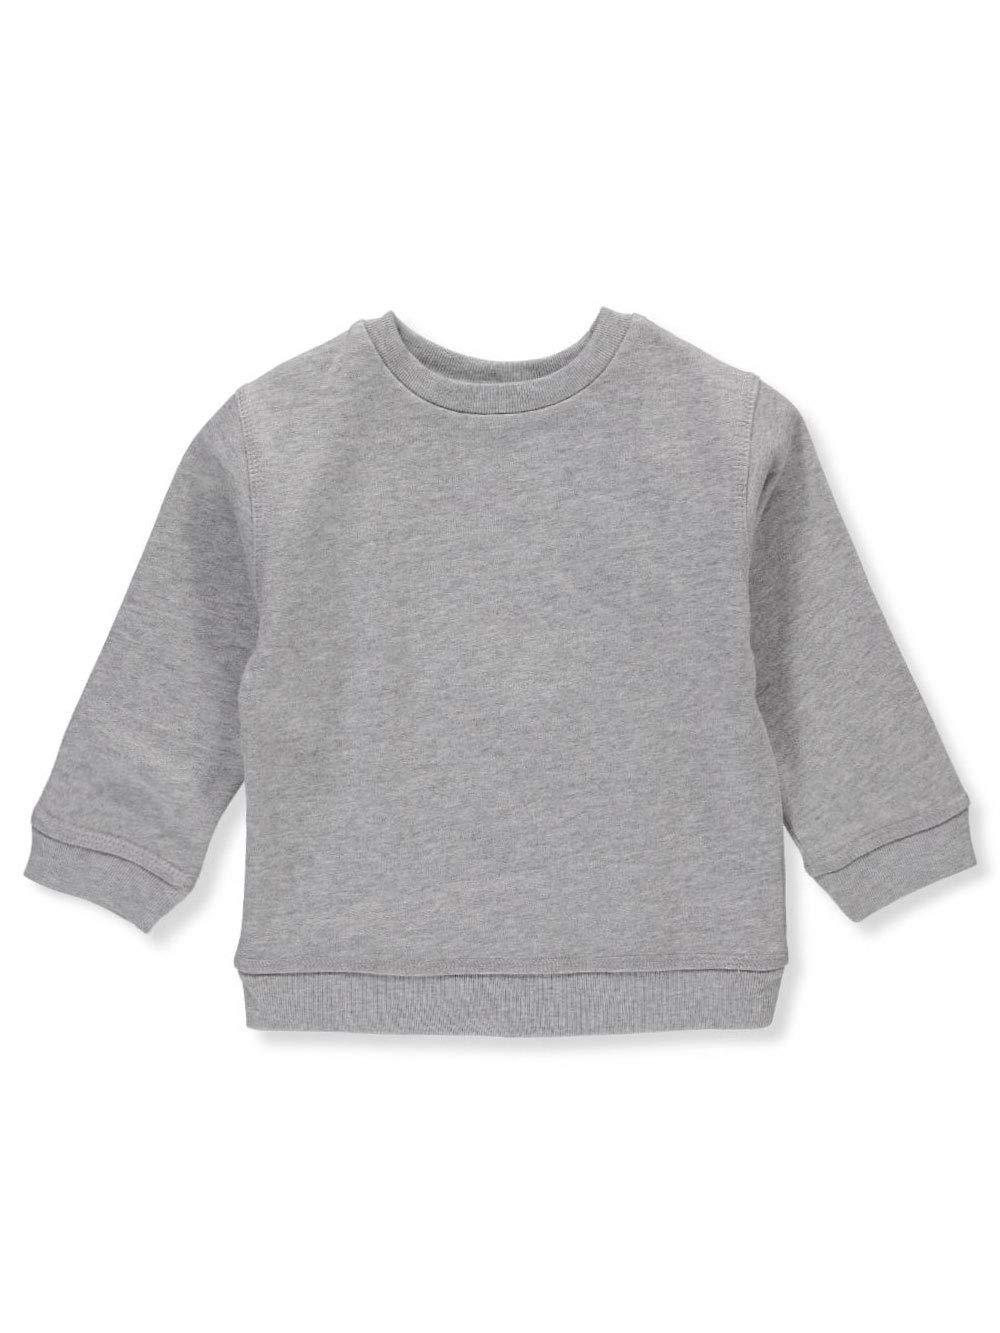 Miniwear Baby Boys' Sweatshirt - heather gray, 18 months